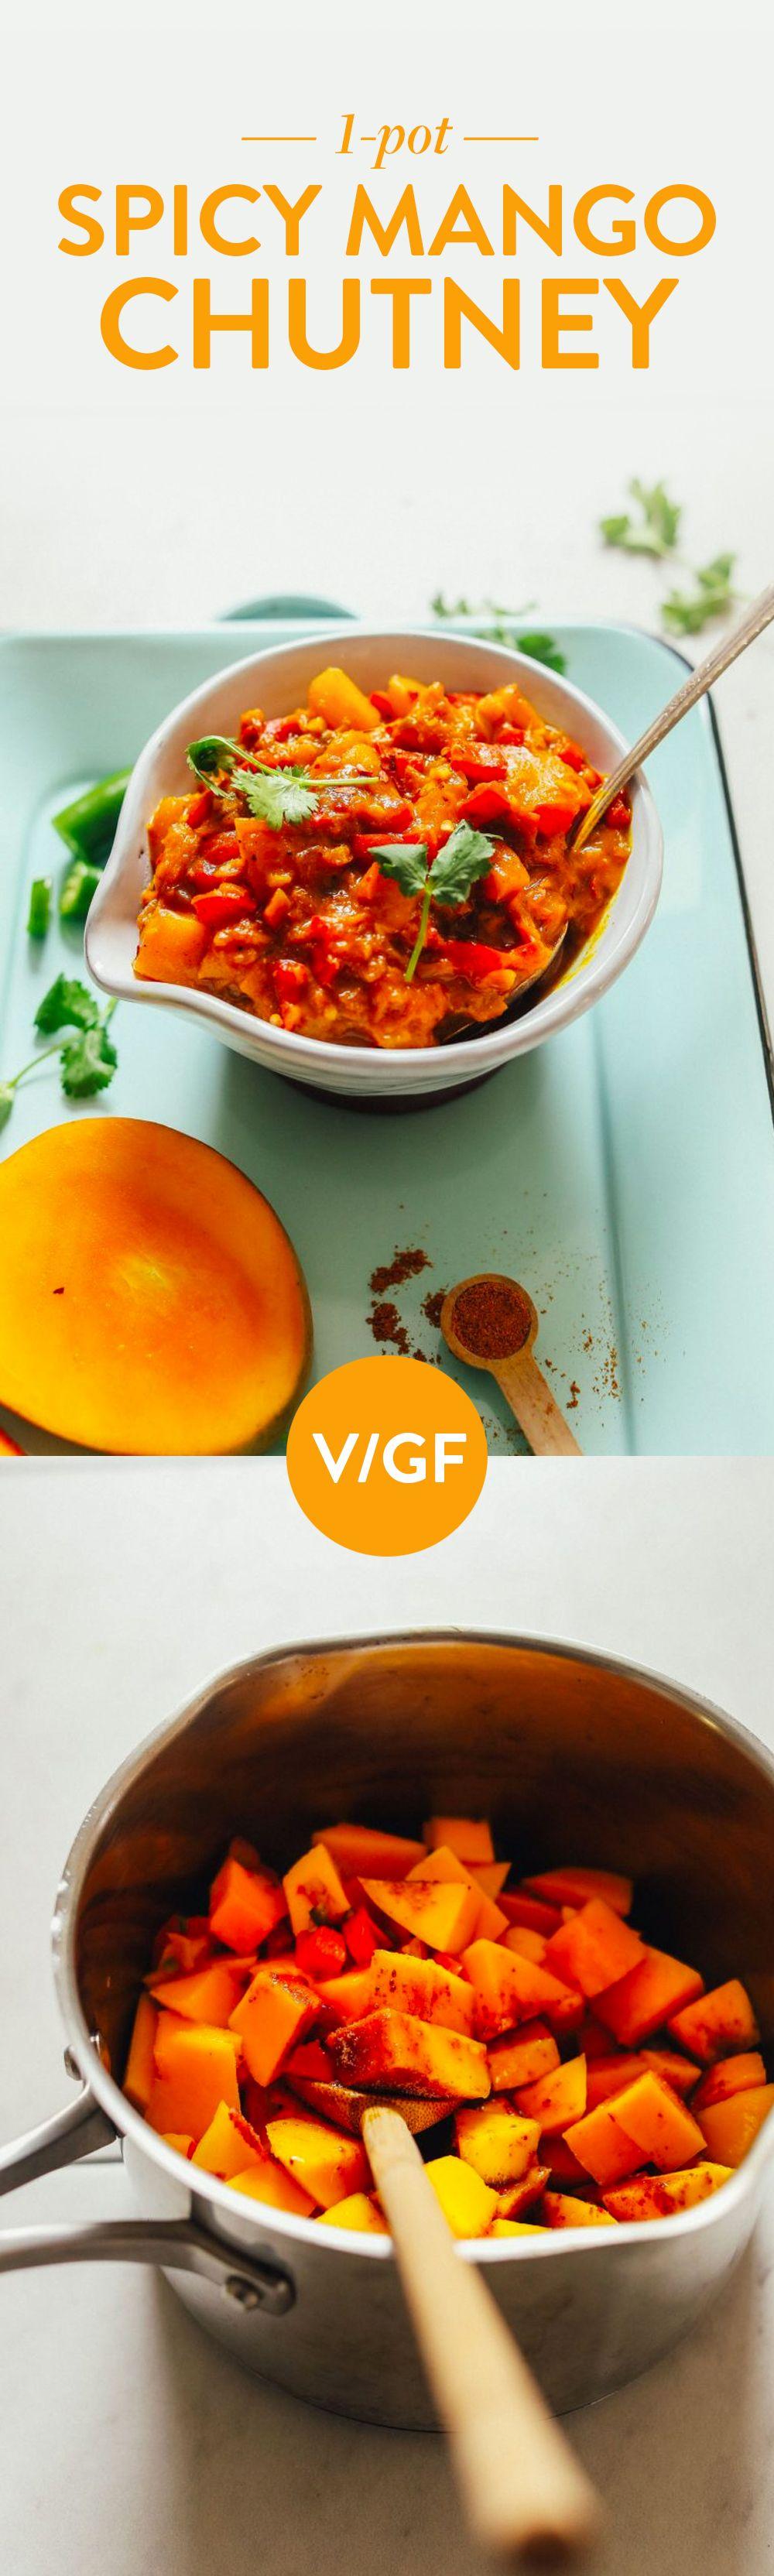 1 Pot Spicy Mango Chutney